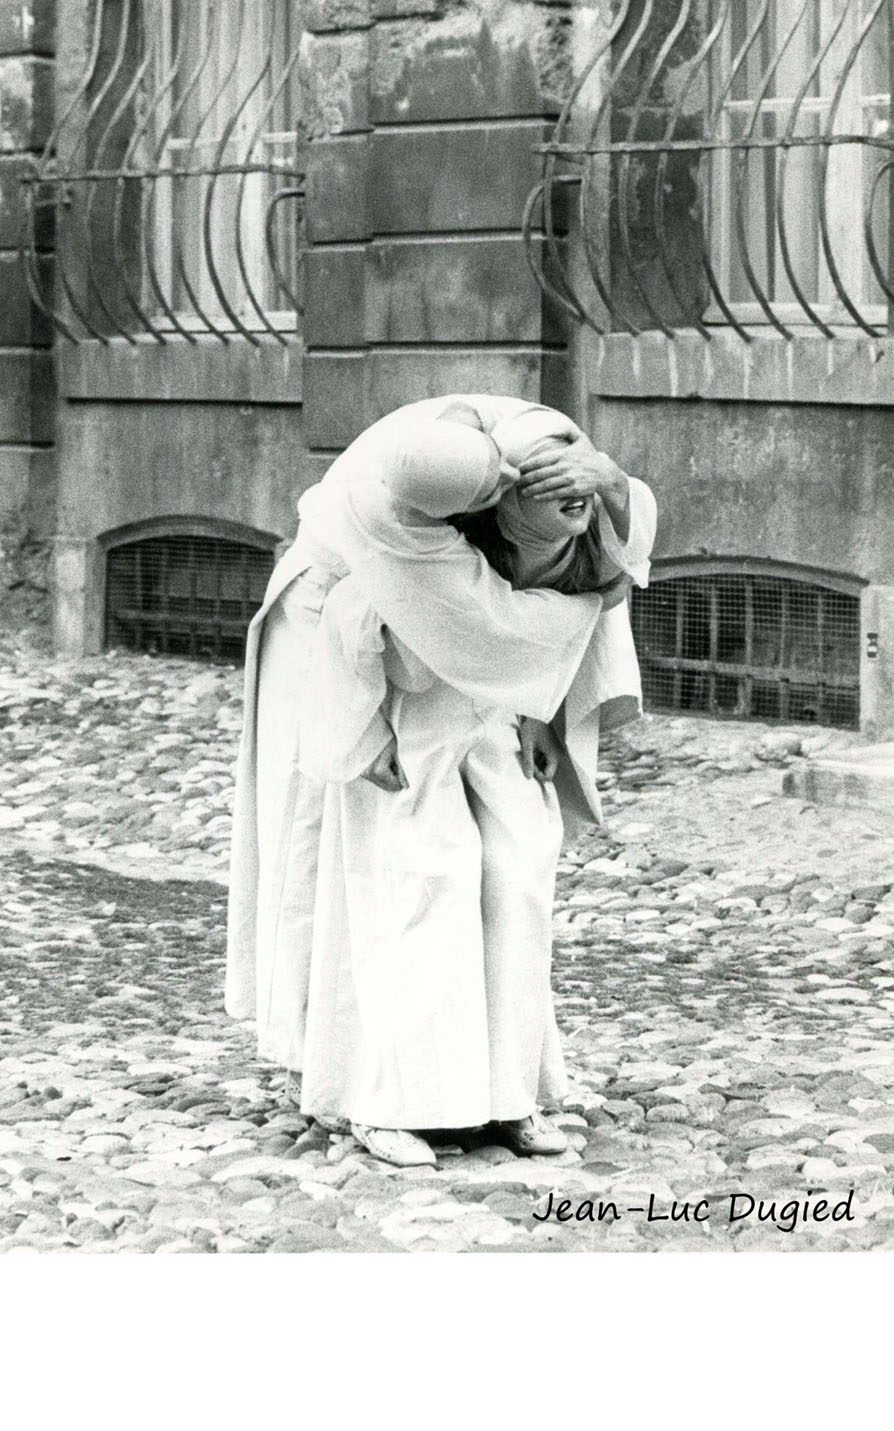 7 Hernu Nadine - accoules avec Christine van Maerrem - 1988